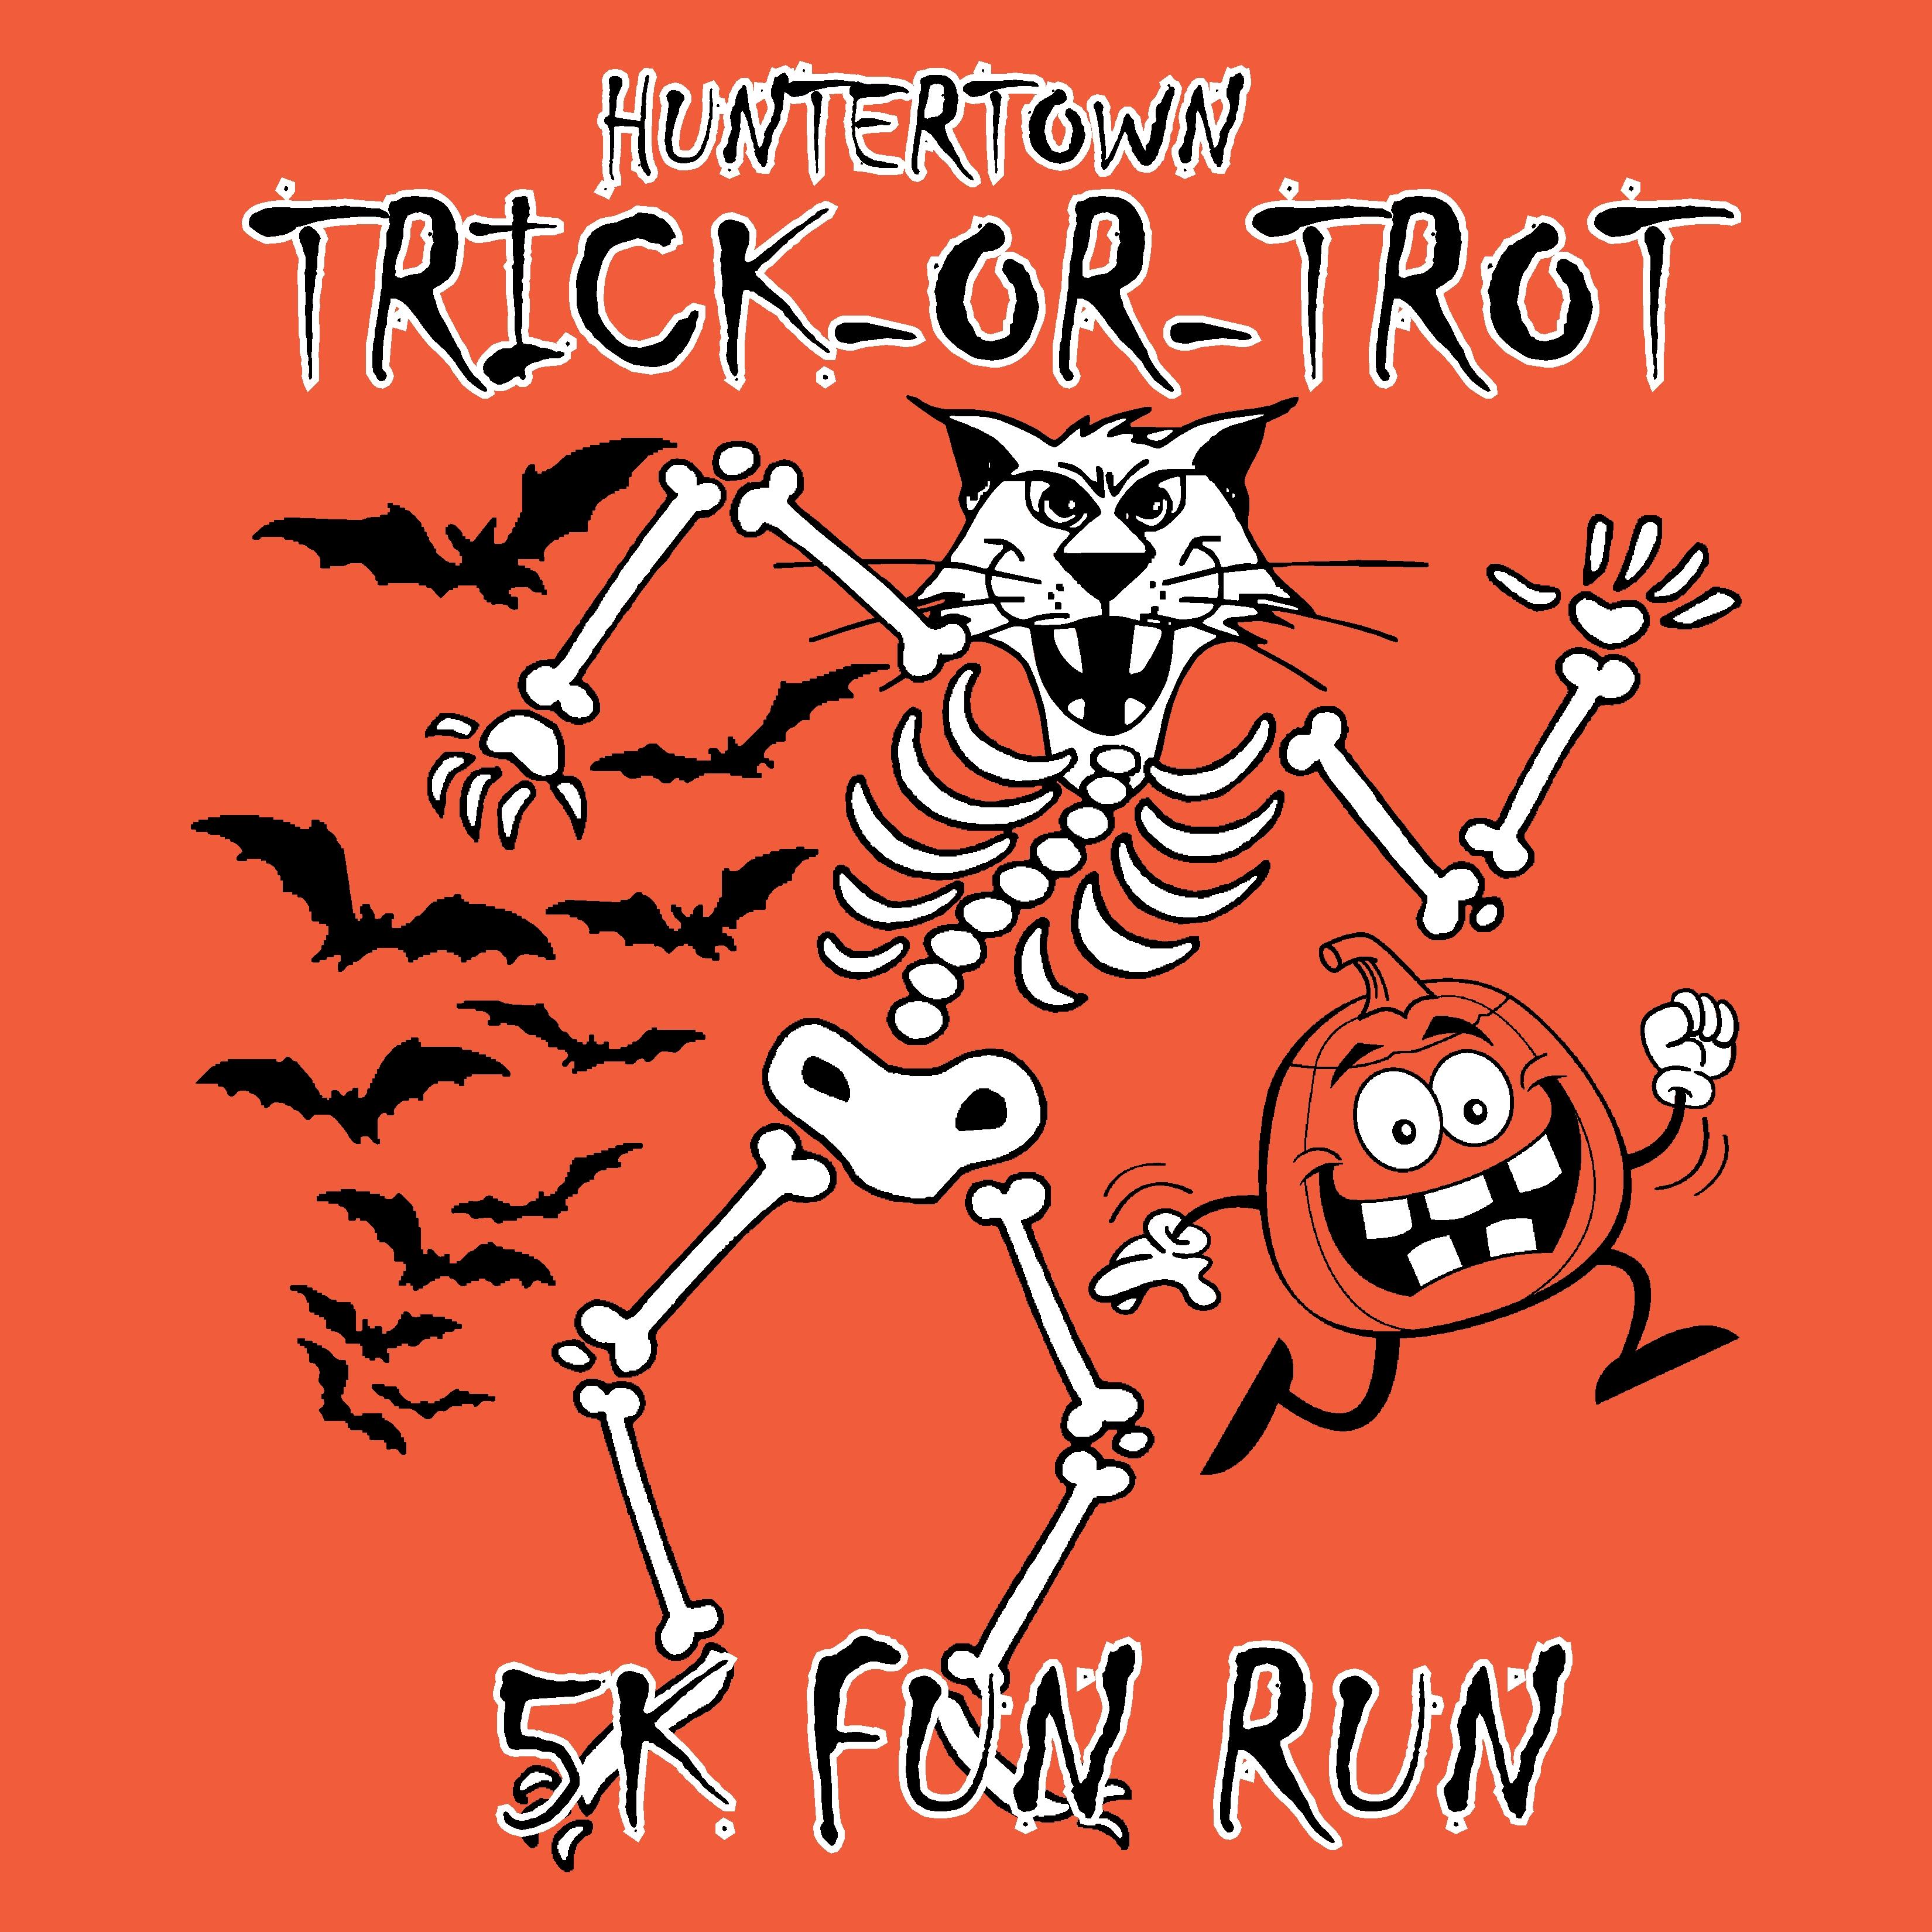 2016 Huntertown Trick-or-Trot 5k